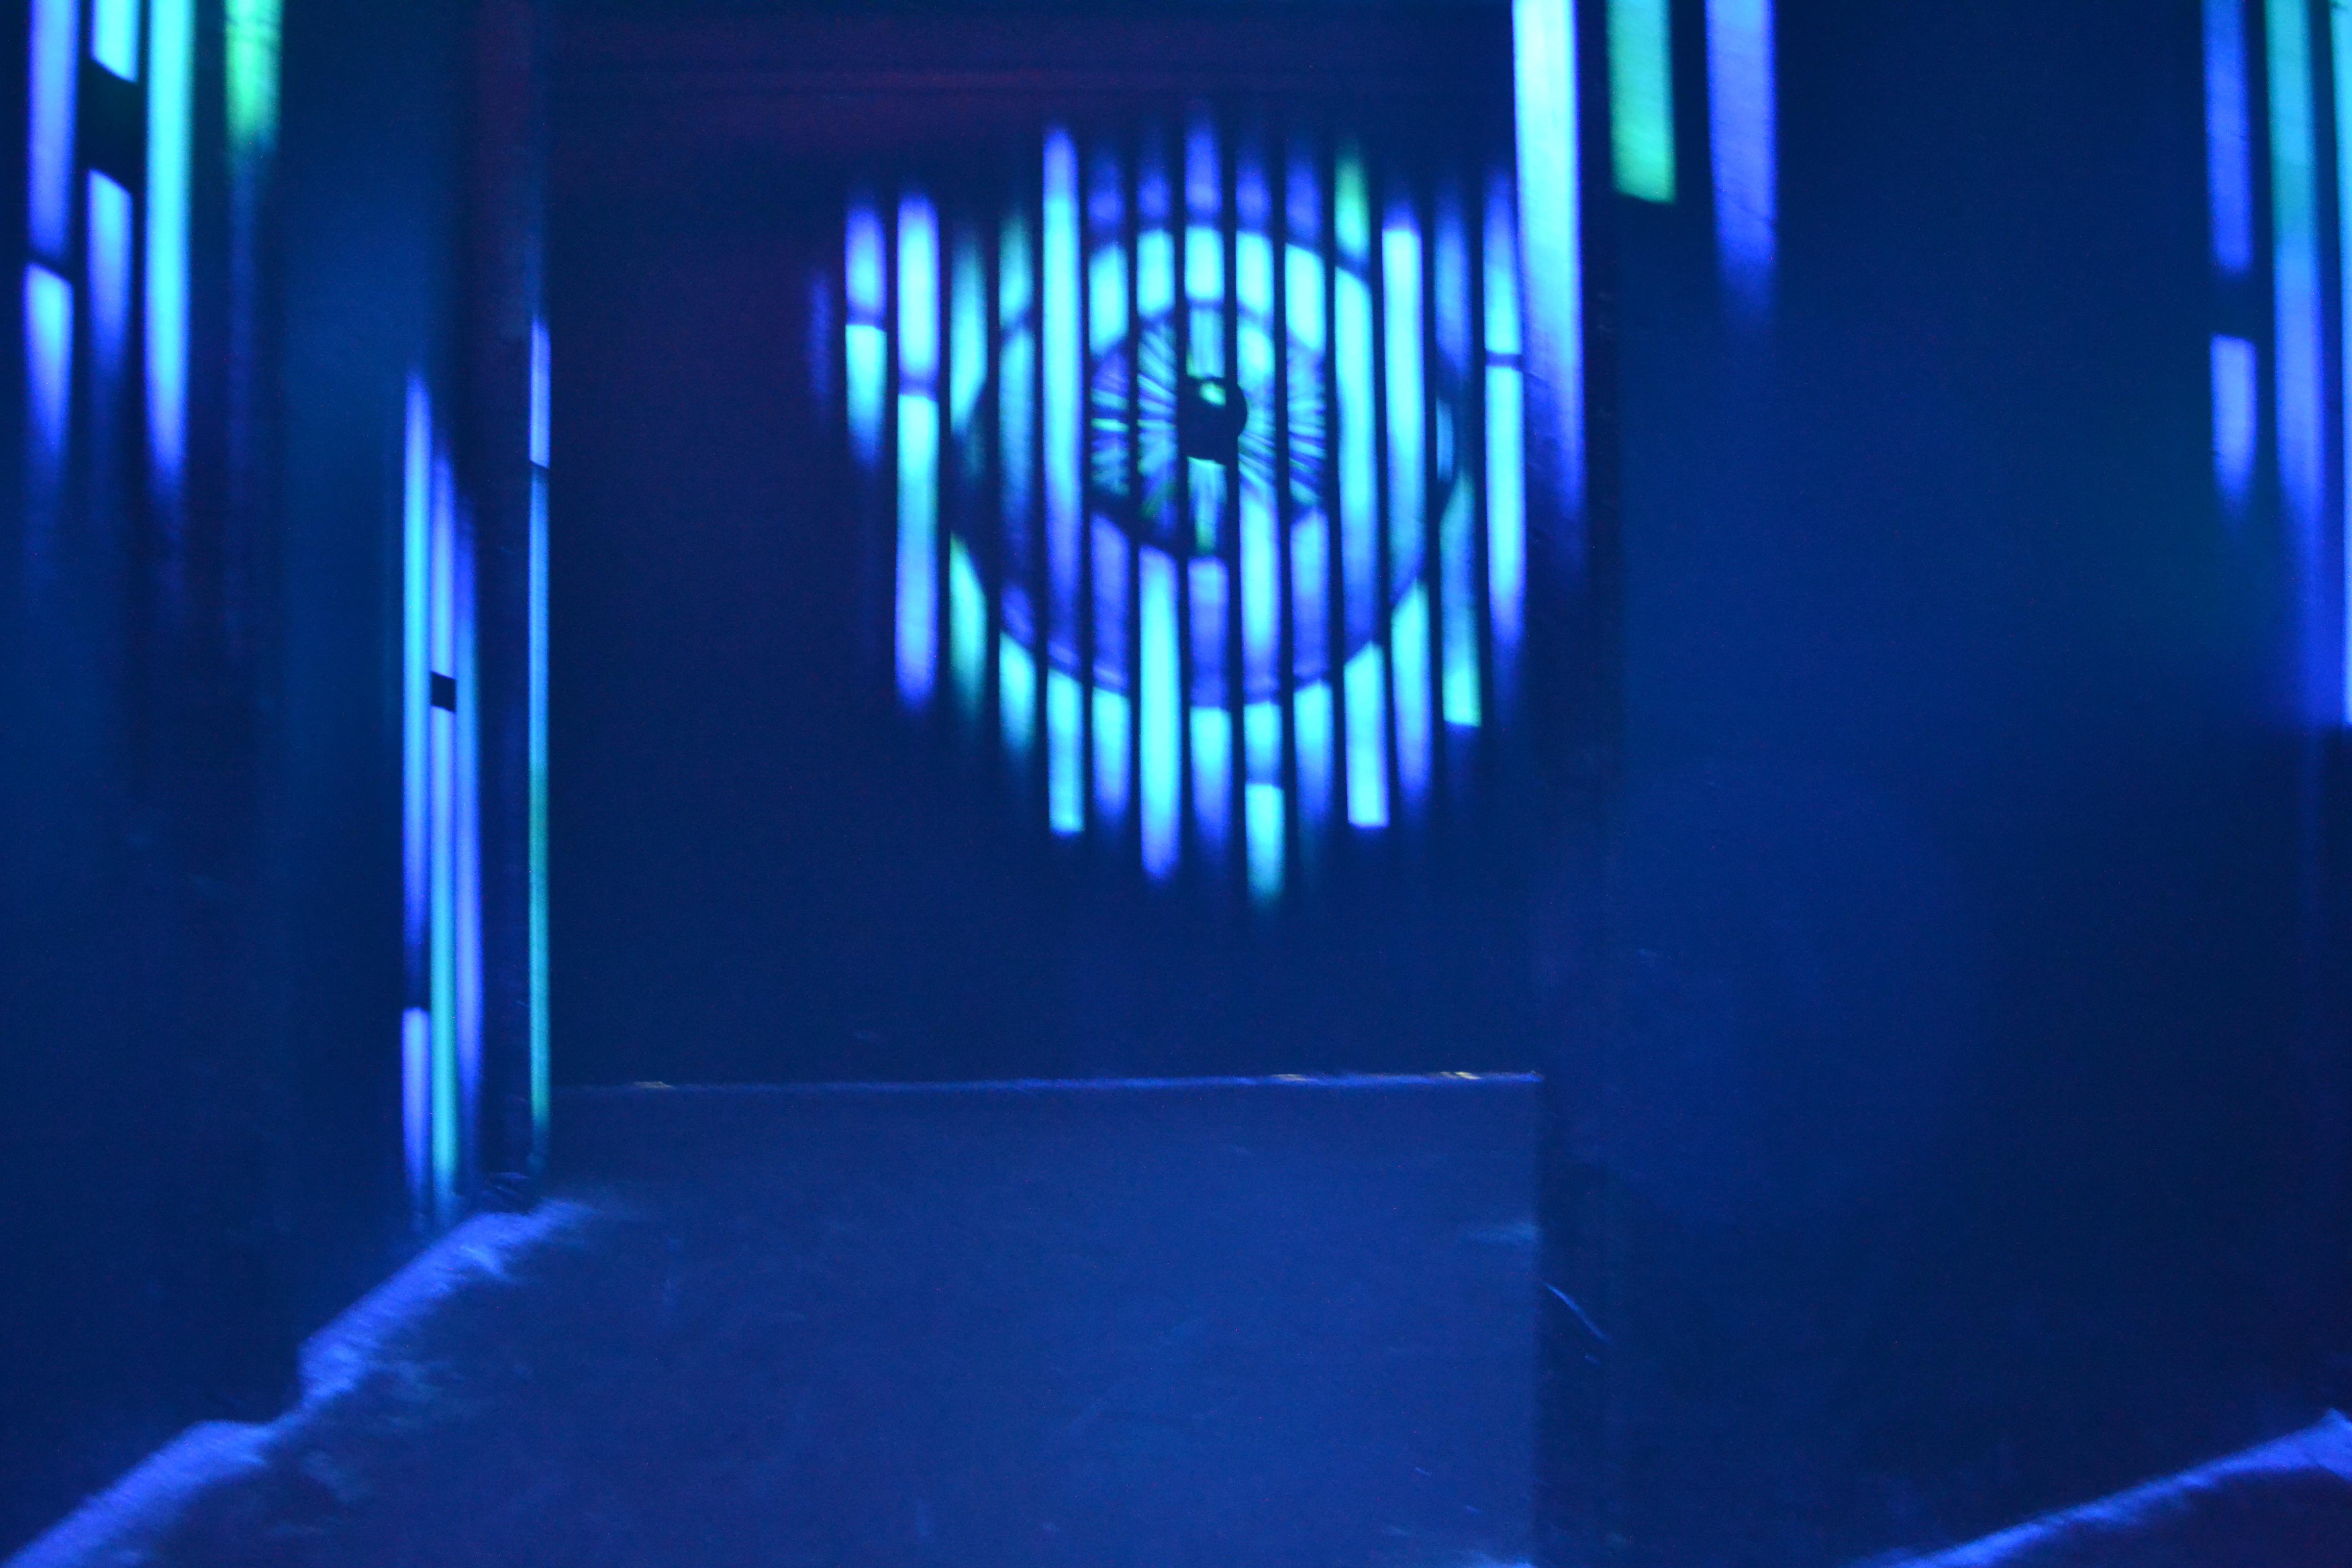 Le garage bowling lasergame